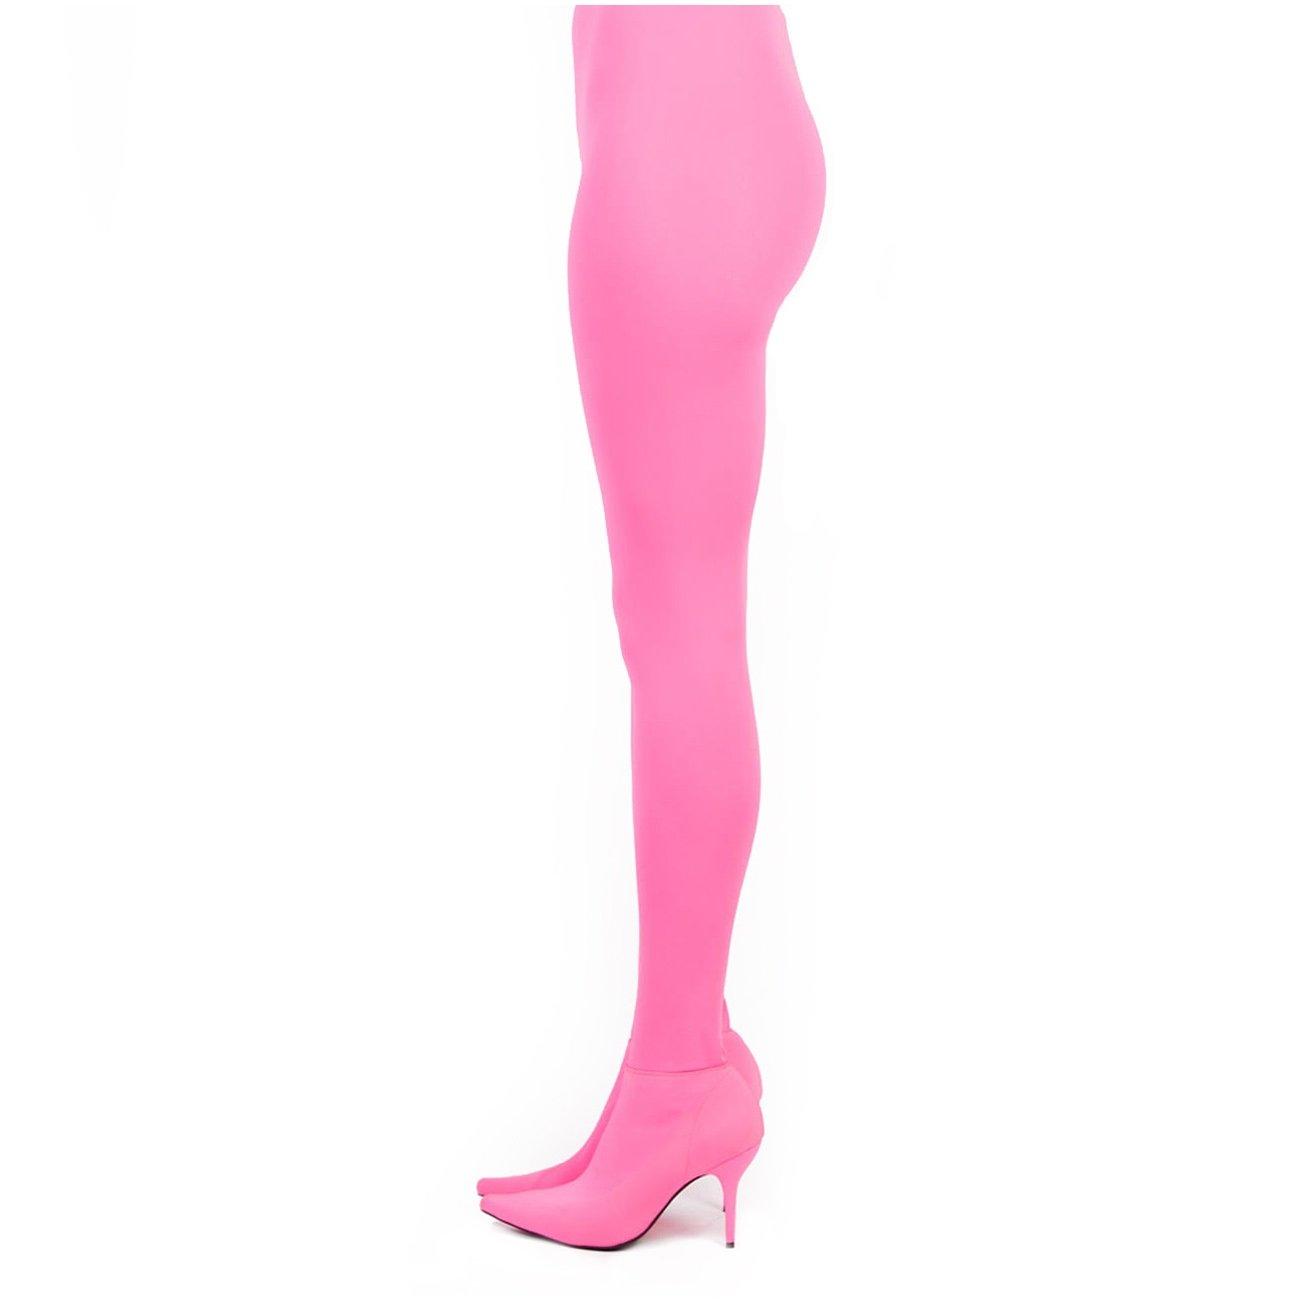 Jeffrey Campbell Bonustrack ', Pink, Pant Boot, 9.5